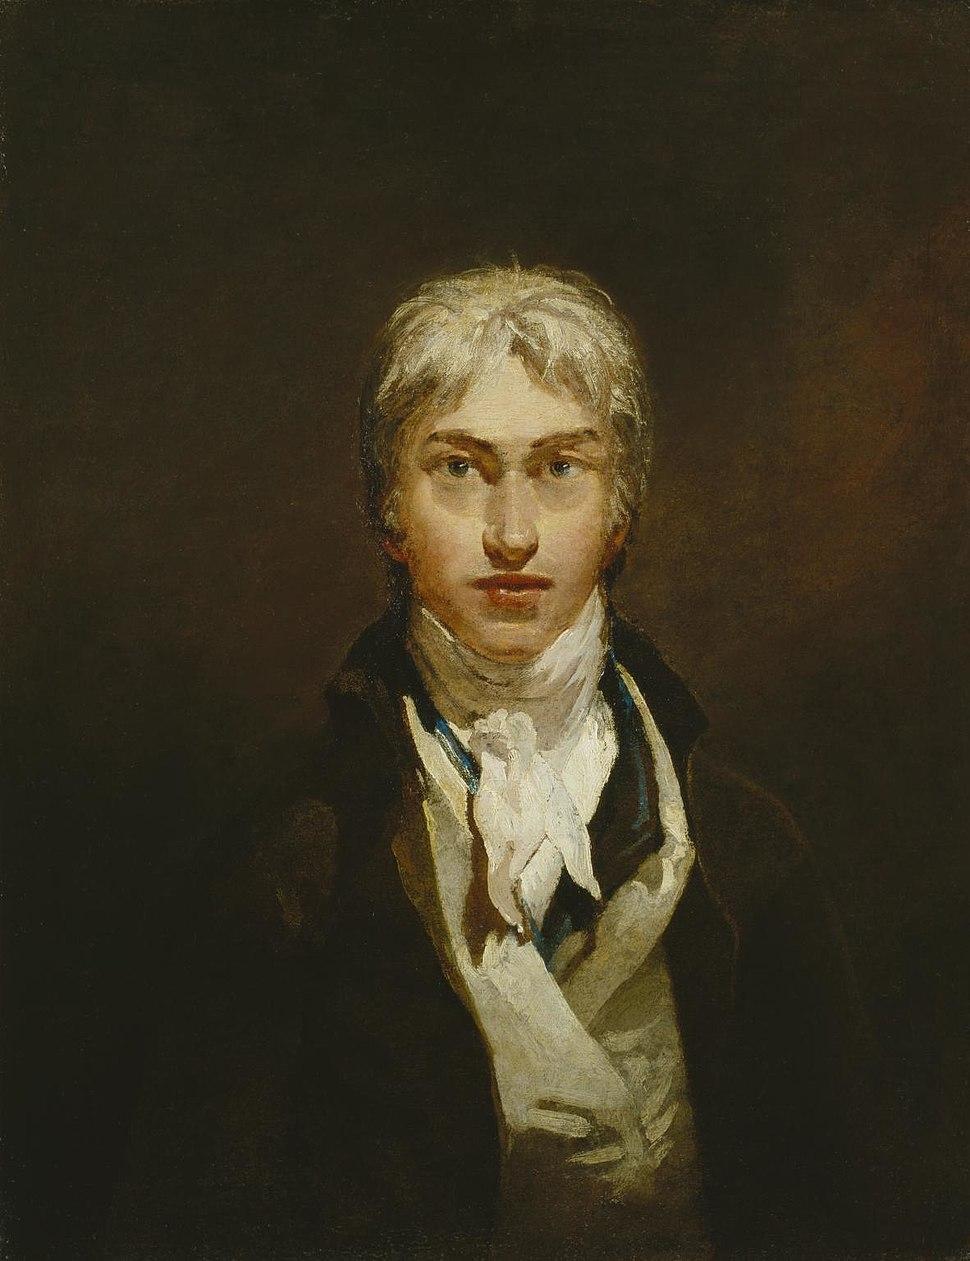 Joseph Mallord William Turner Self Portrait 1799